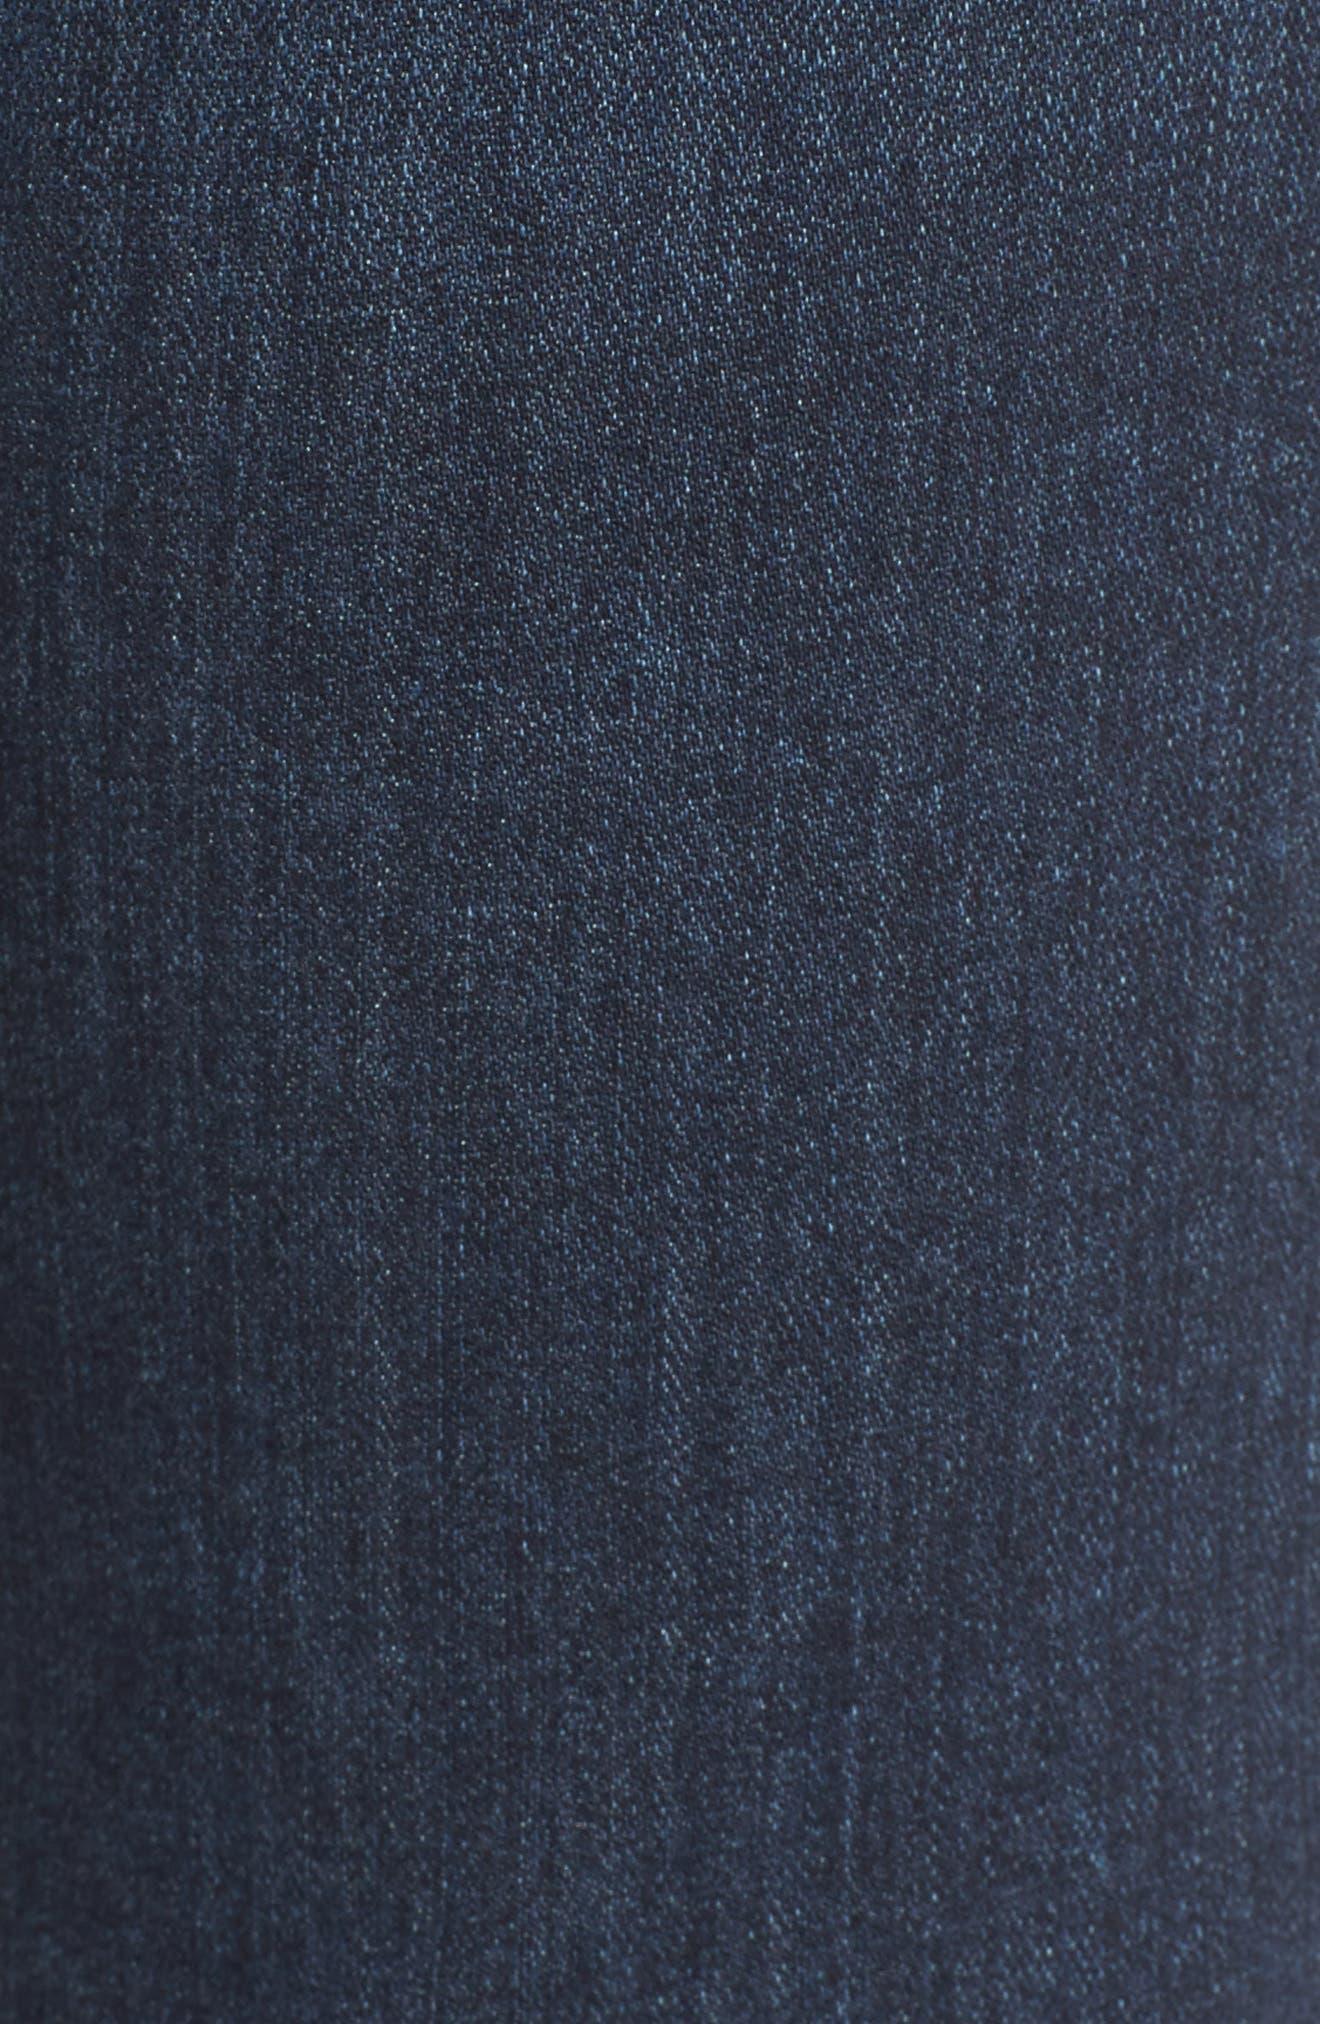 Collin Supermodel Skinny Jeans,                             Alternate thumbnail 5, color,                             422